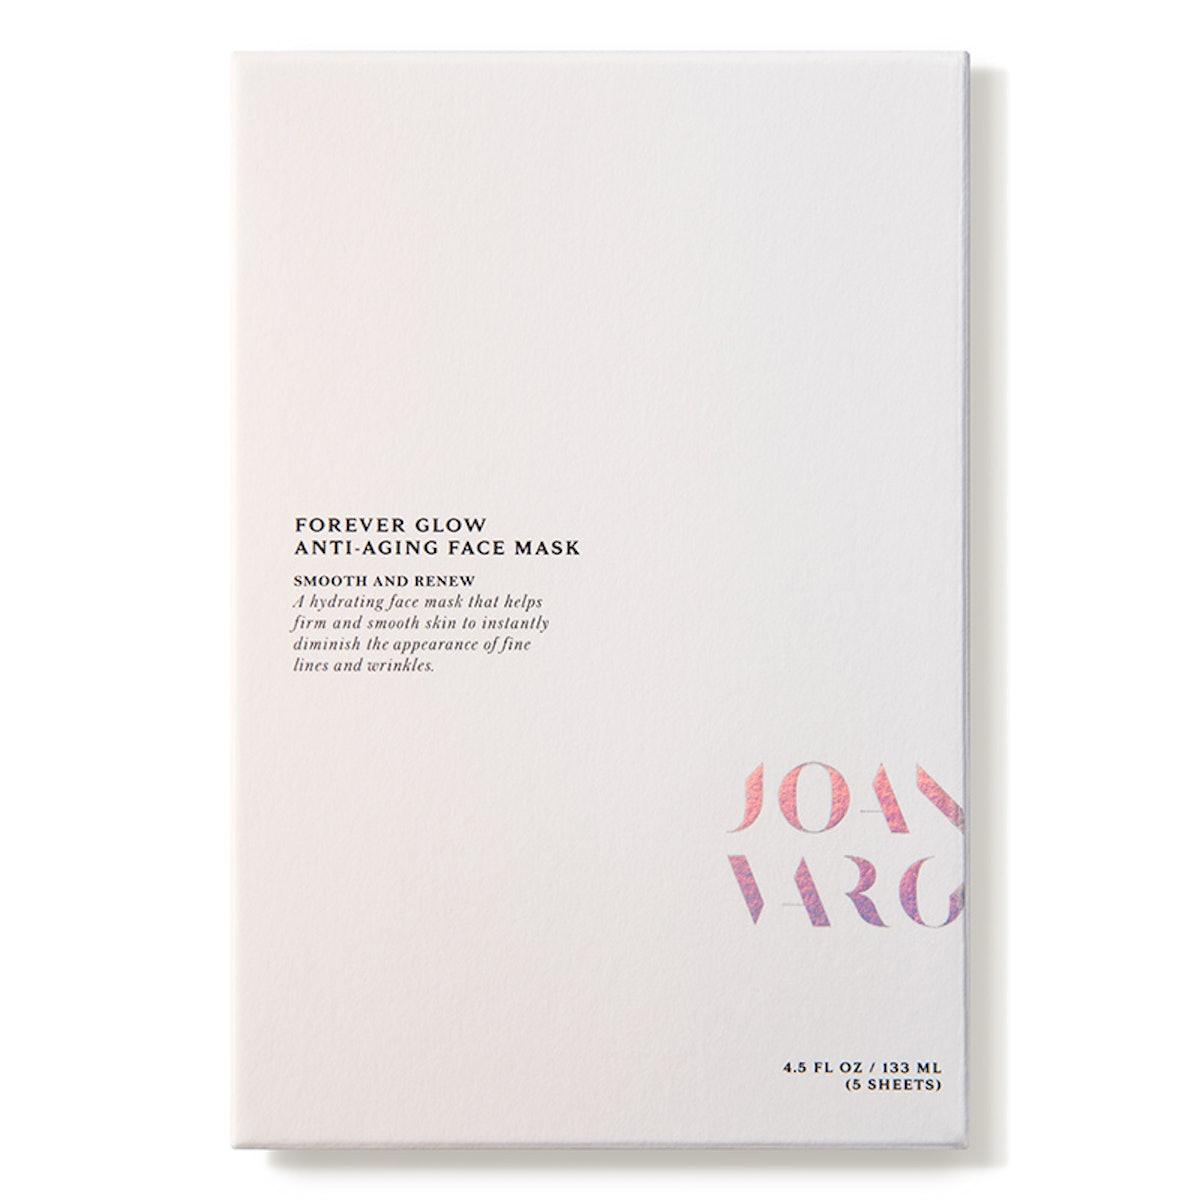 Joanna Vargas Forever Glow Face Mask